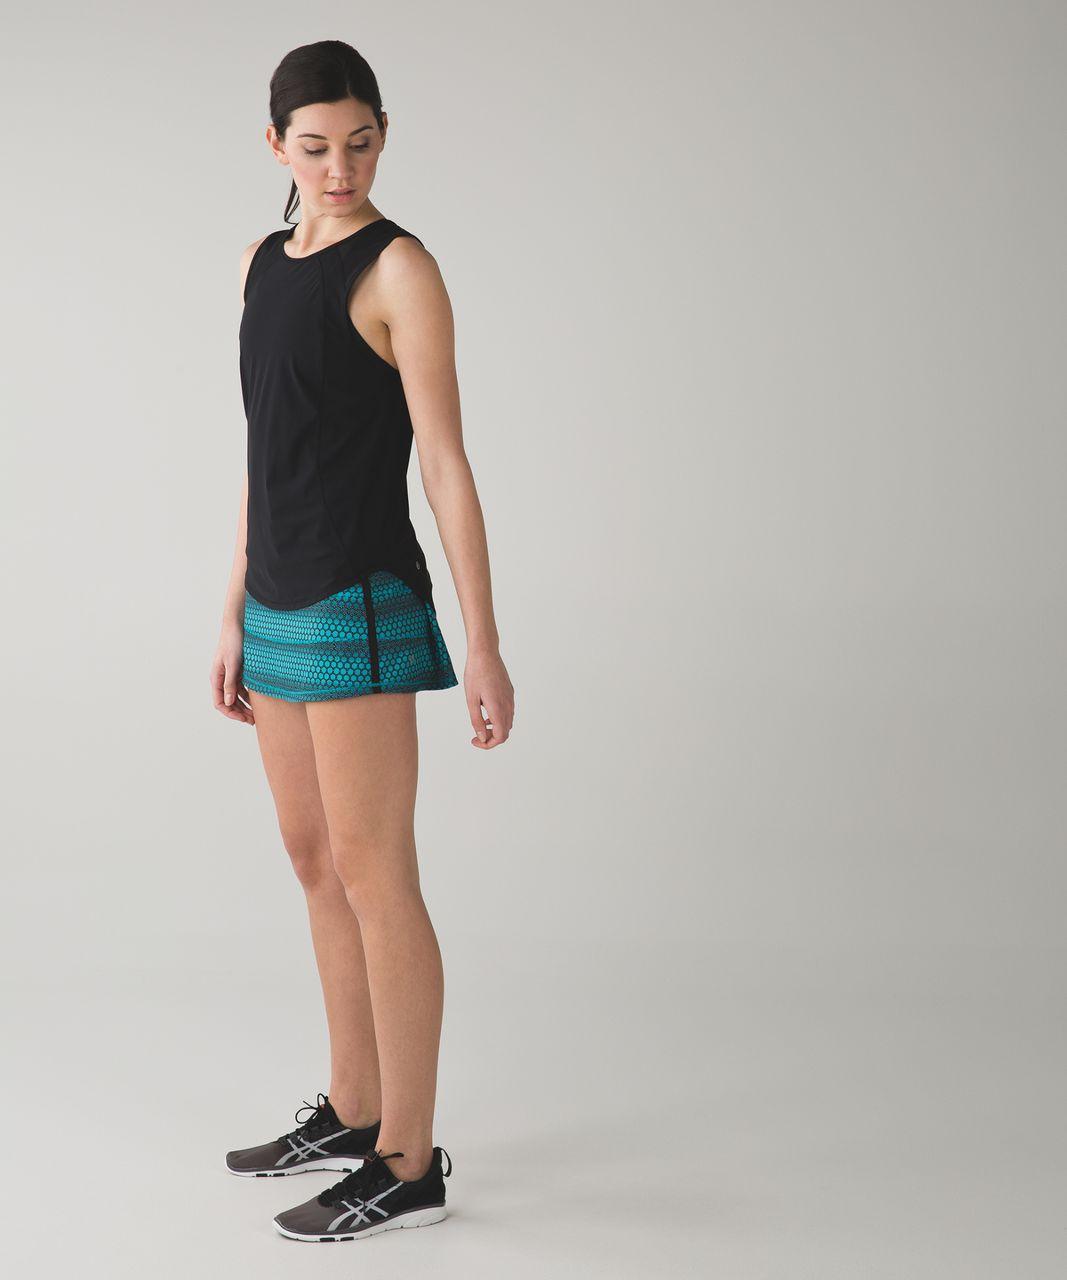 Lululemon Pace Rival Skirt II (Regular) *4-way Stretch - Stardust Geo Peacock Blue Black / Black